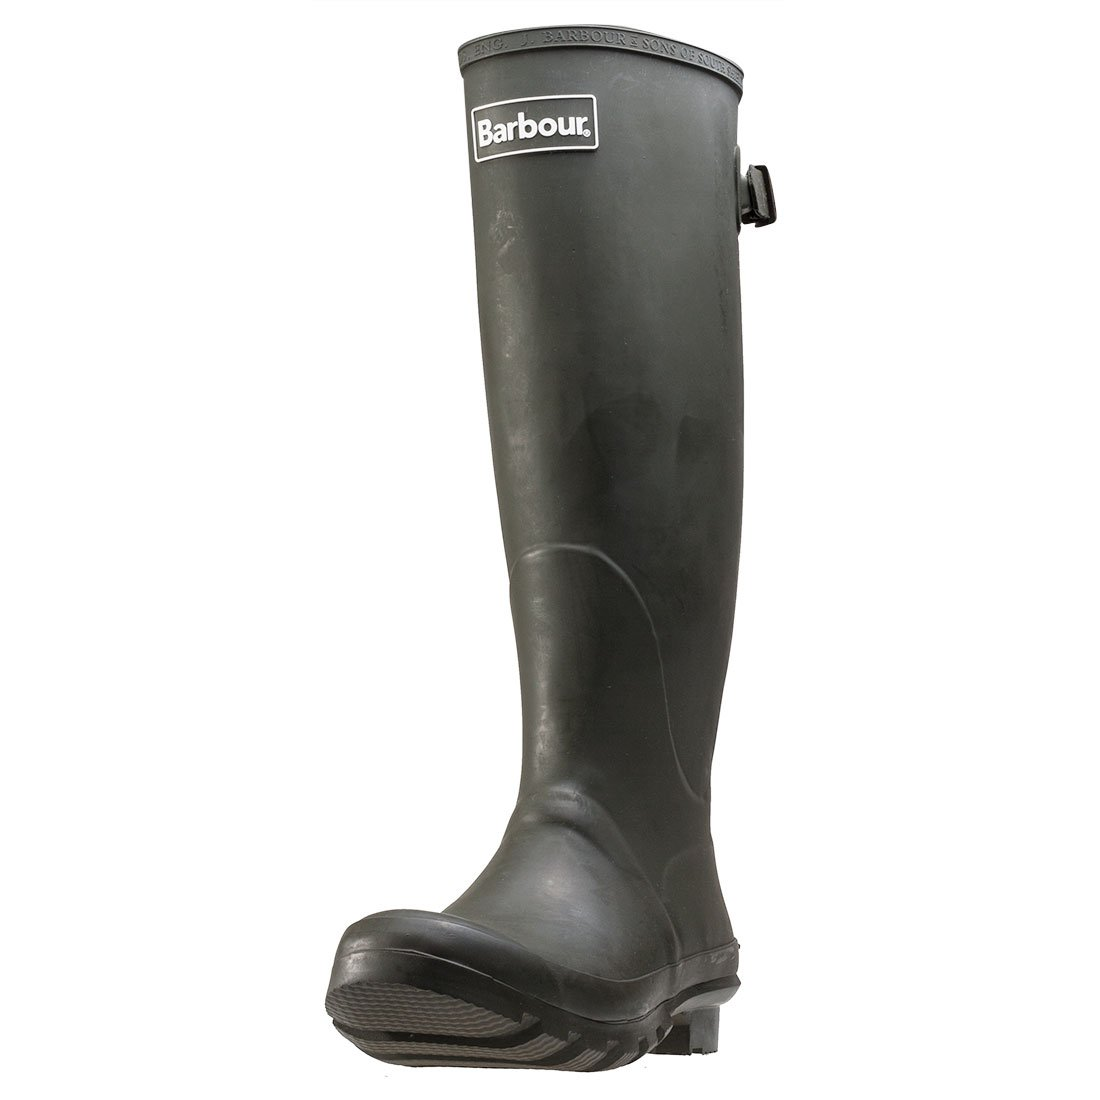 Womens Barbour Jarrow Mid Calf Winter Waterproof Wellington Rain Boots B00O8UA9Q8 9 B(M) US|Dark Olive